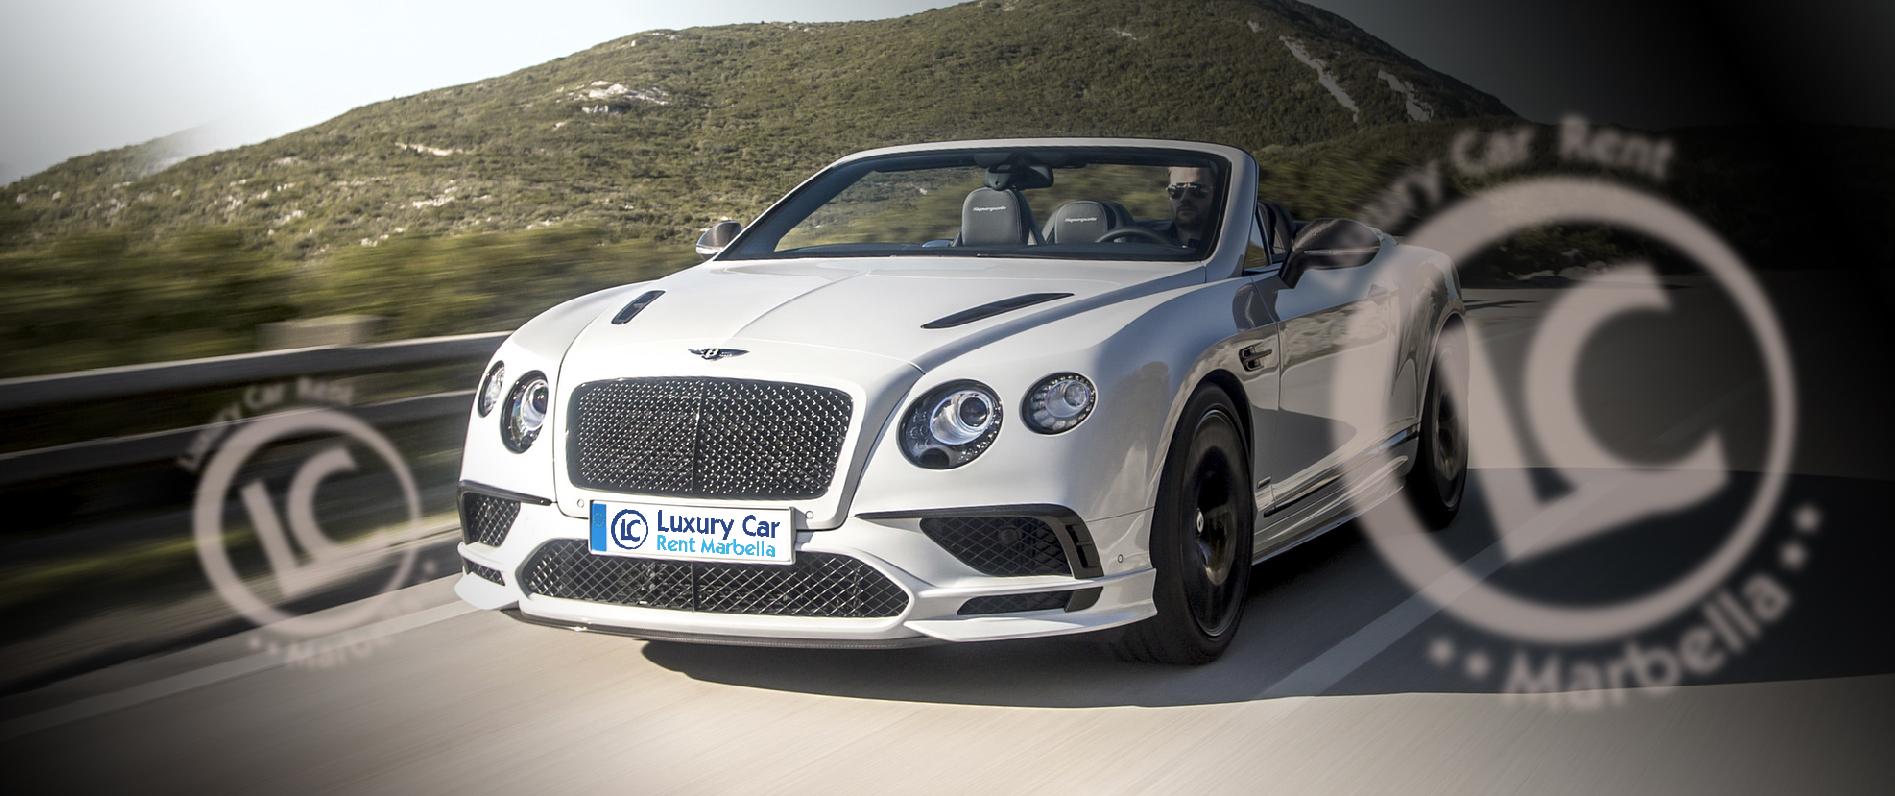 Luxury Car Rent Marbella Luxury Cars Marbella And Malaga